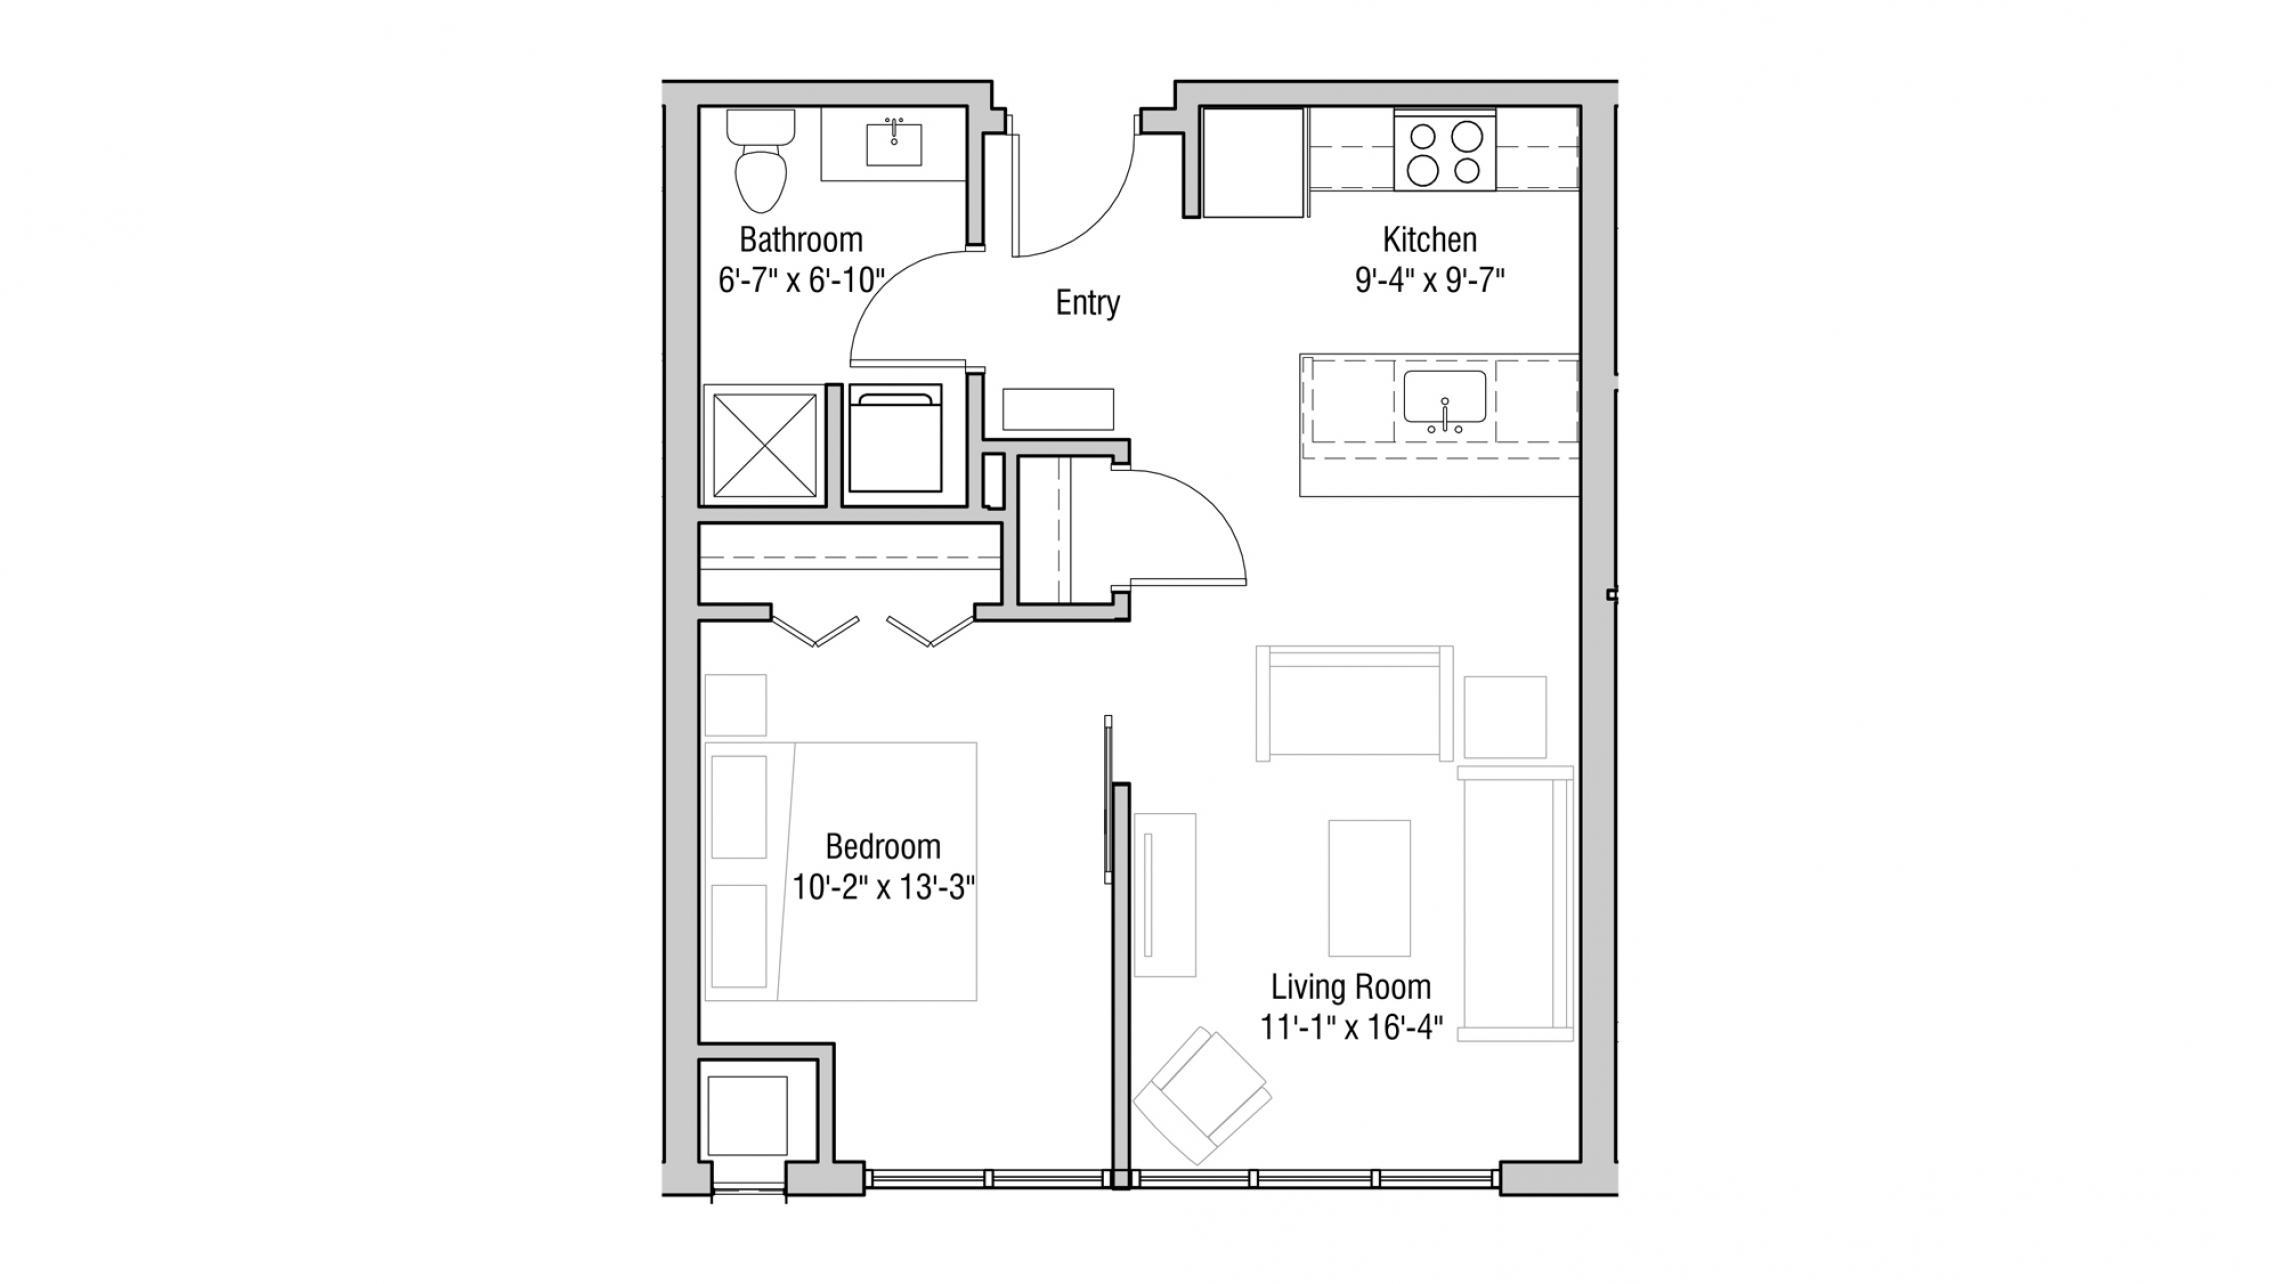 ULI Quarter Row 220 - One Bedroom, One Bathroom